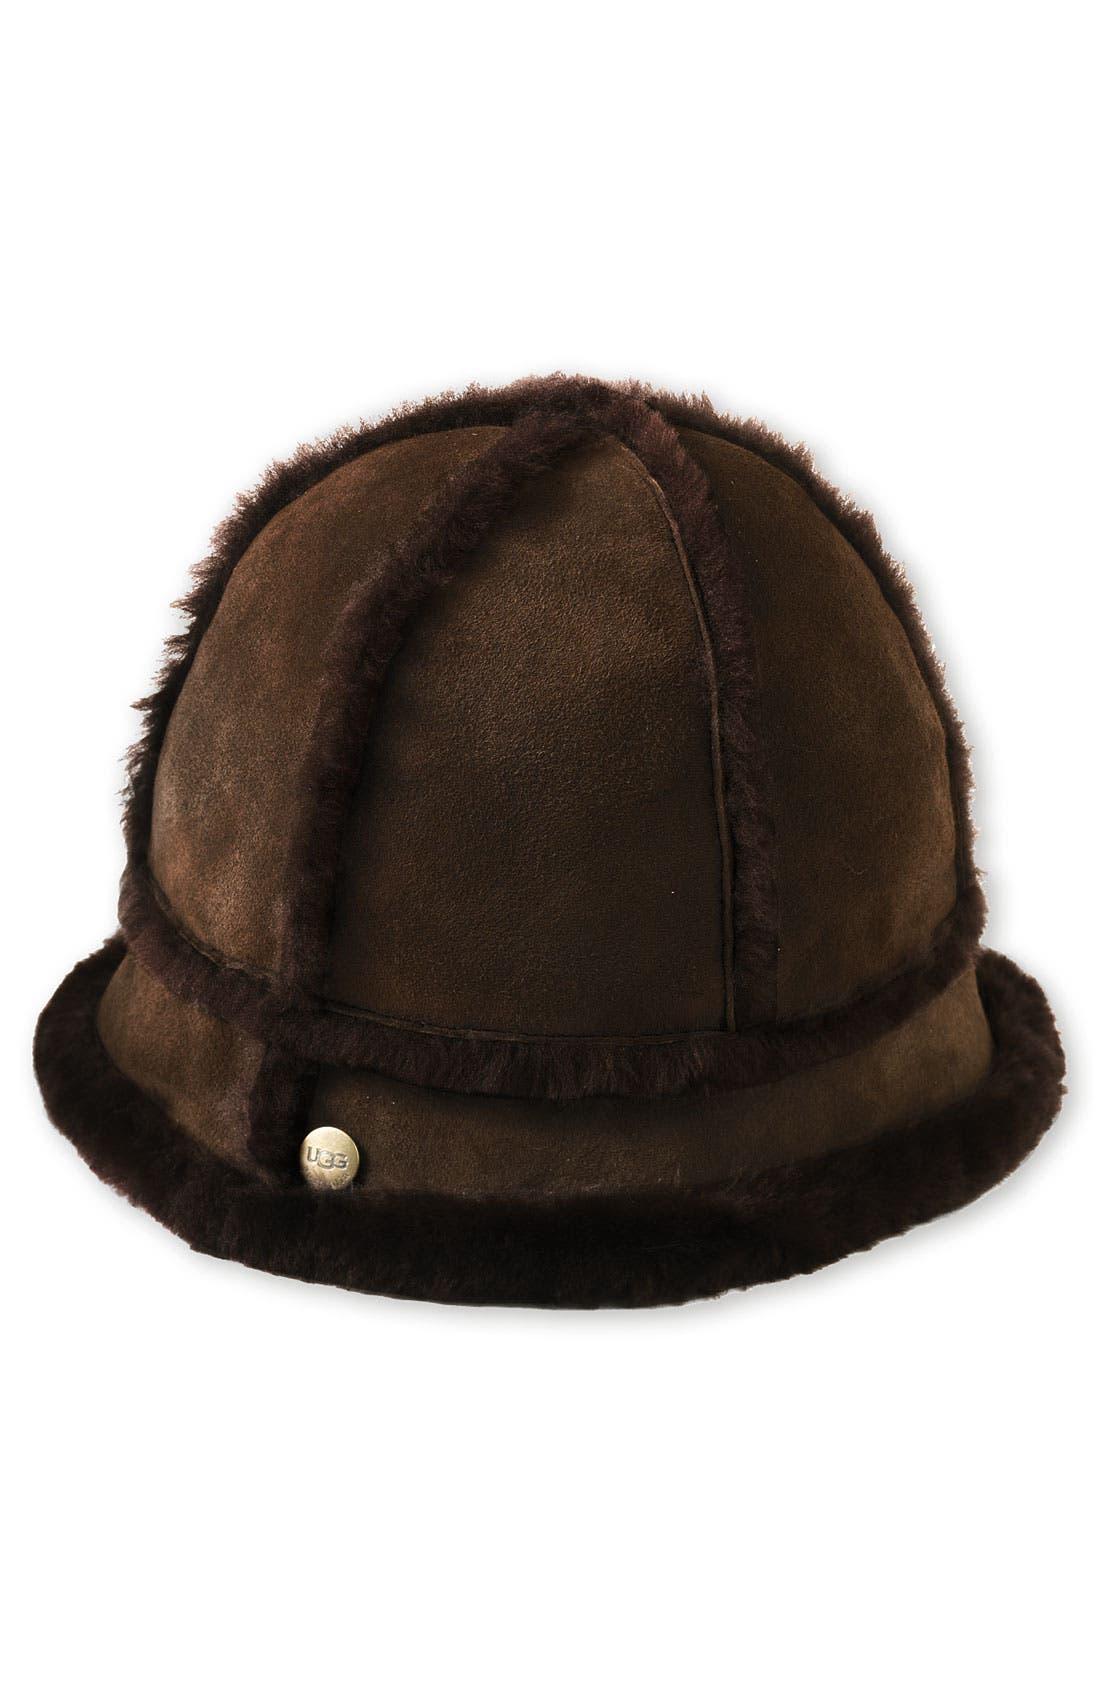 Main Image - UGG® Australia Shearling Bucket Hat